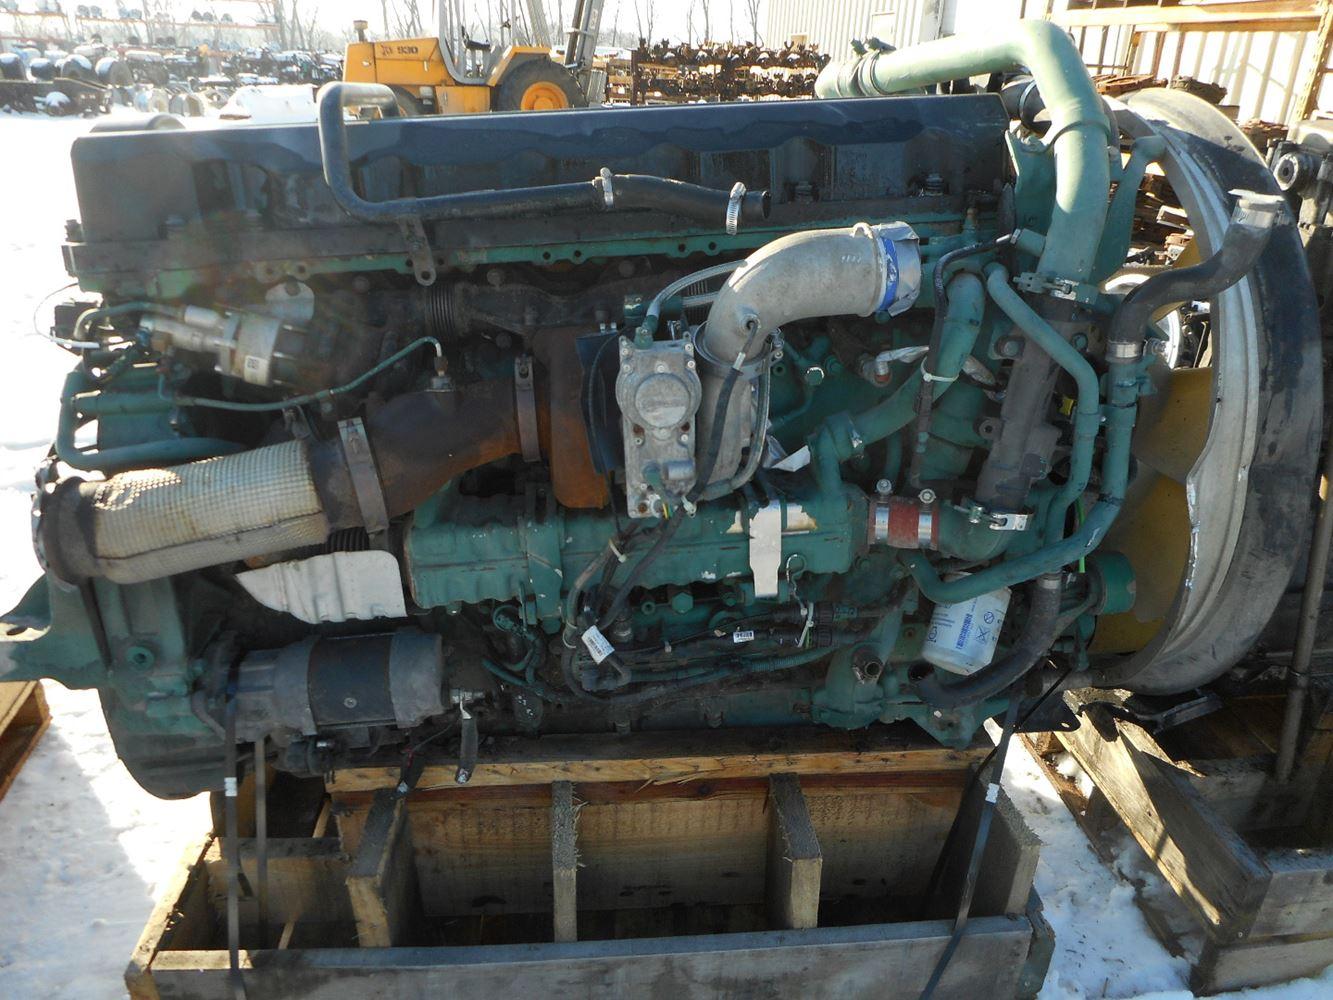 titan next previous volvo listings engine stock sales truck